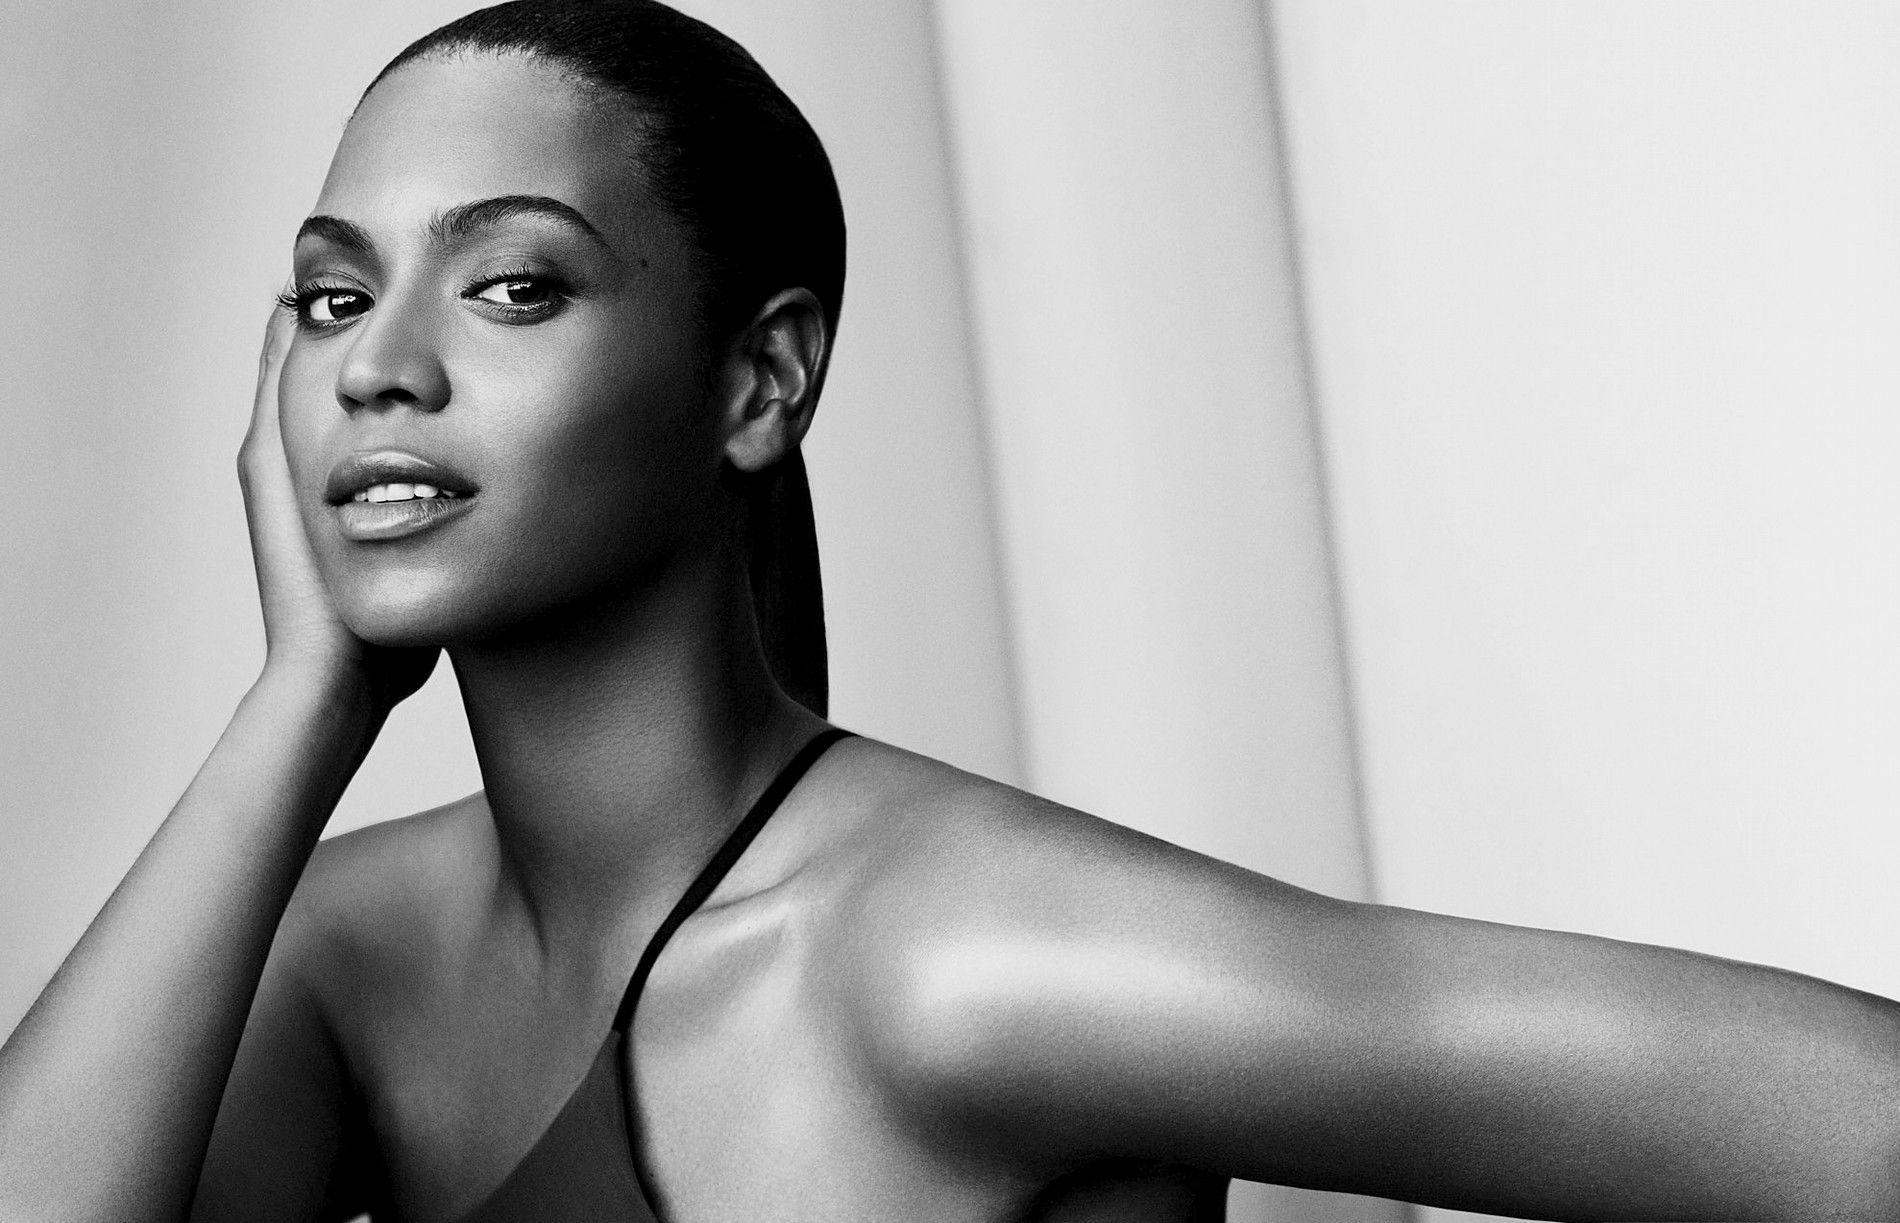 Full HD p Beyonce Wallpapers HD Desktop Backgrounds x